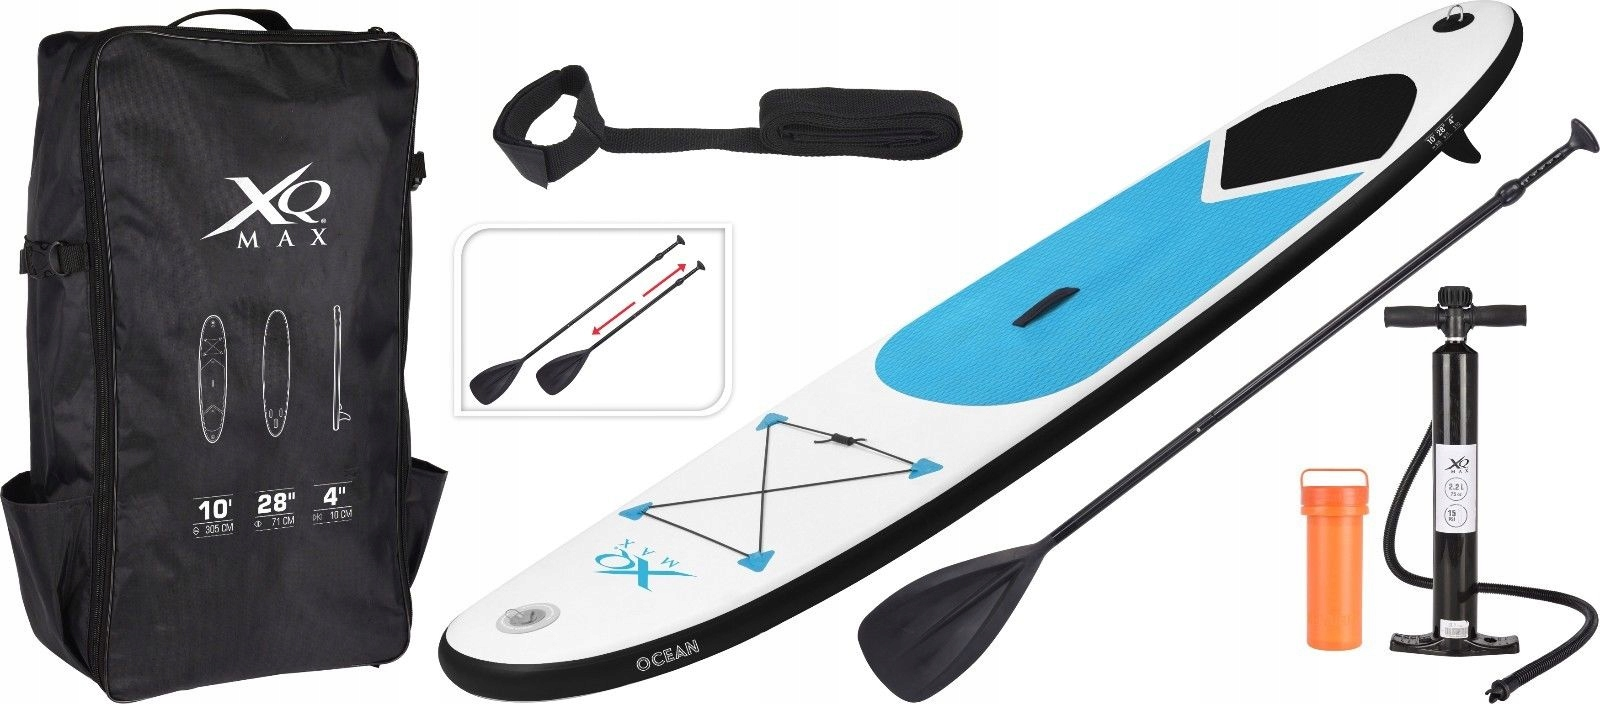 XQ Max SUP Deska Surfingowa PaddleBoard 305cm